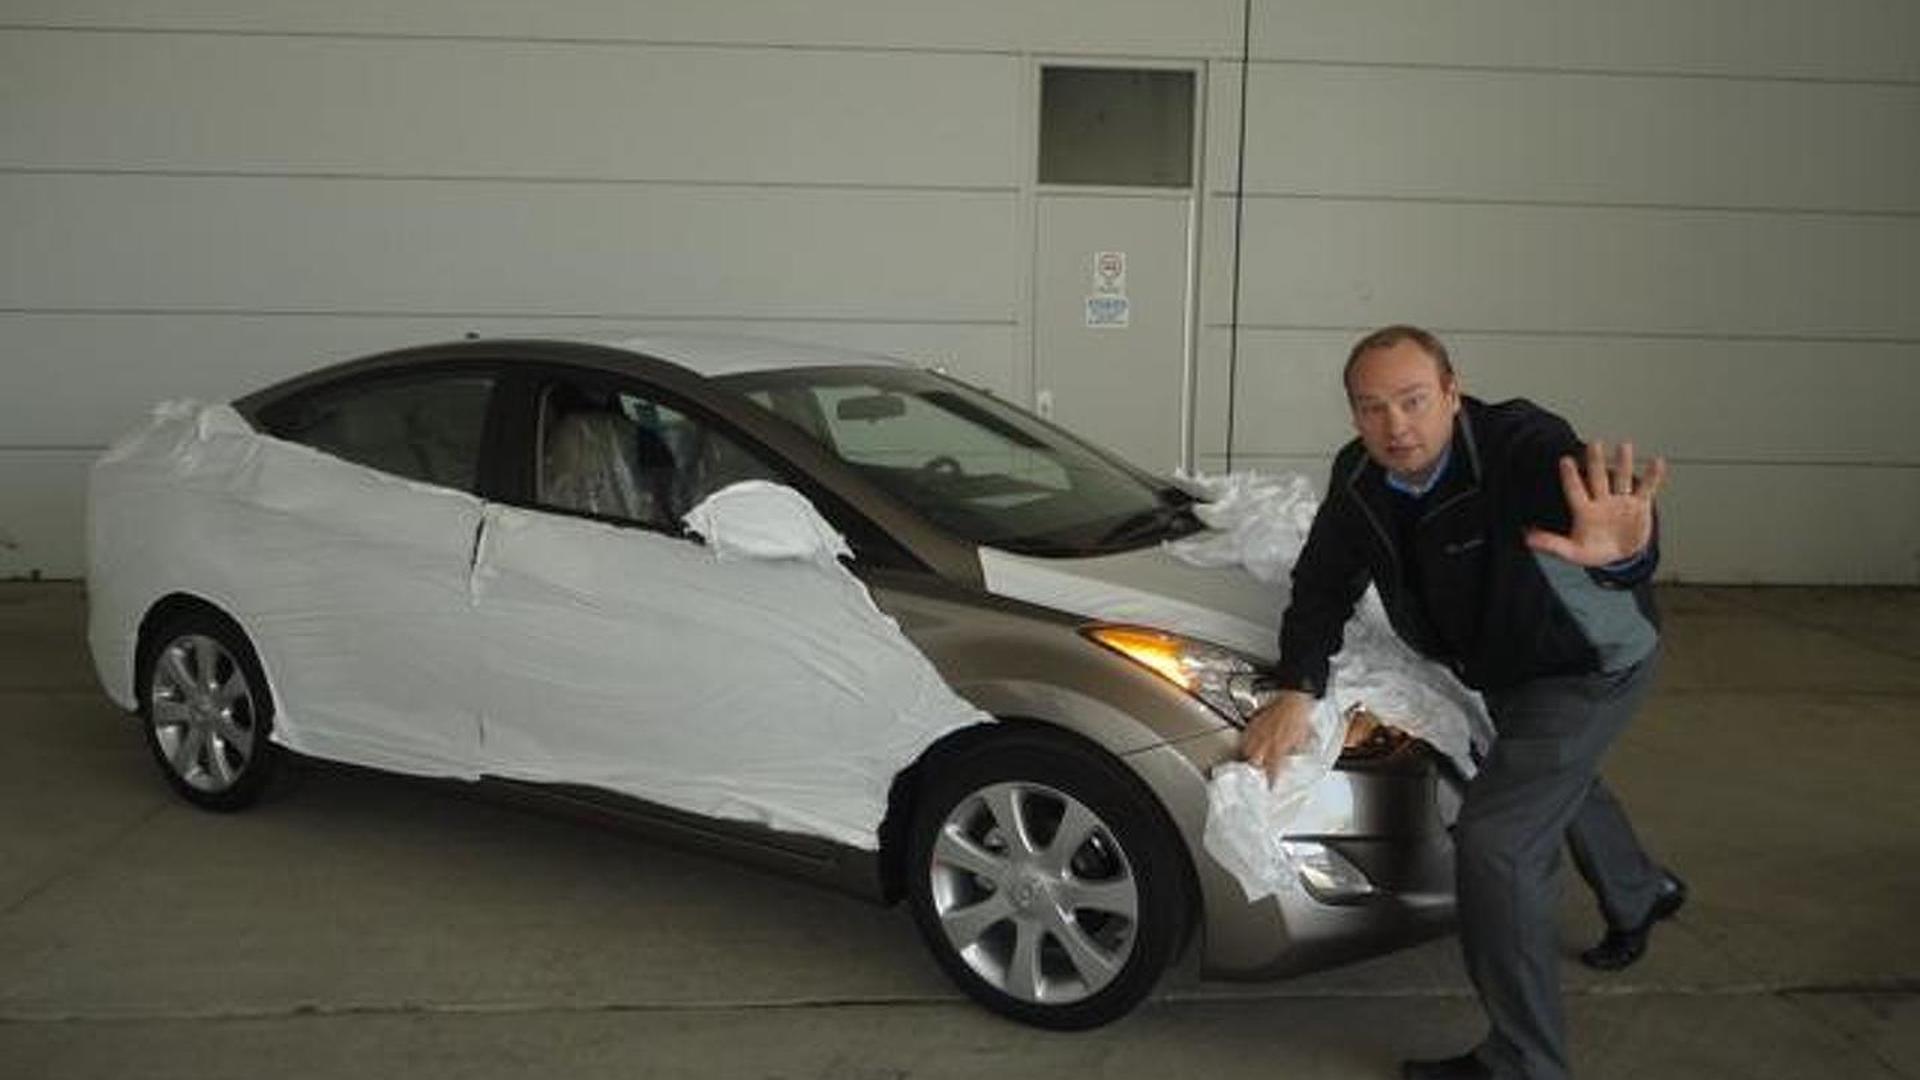 2011 Hyundai Elantra teased on Twitter